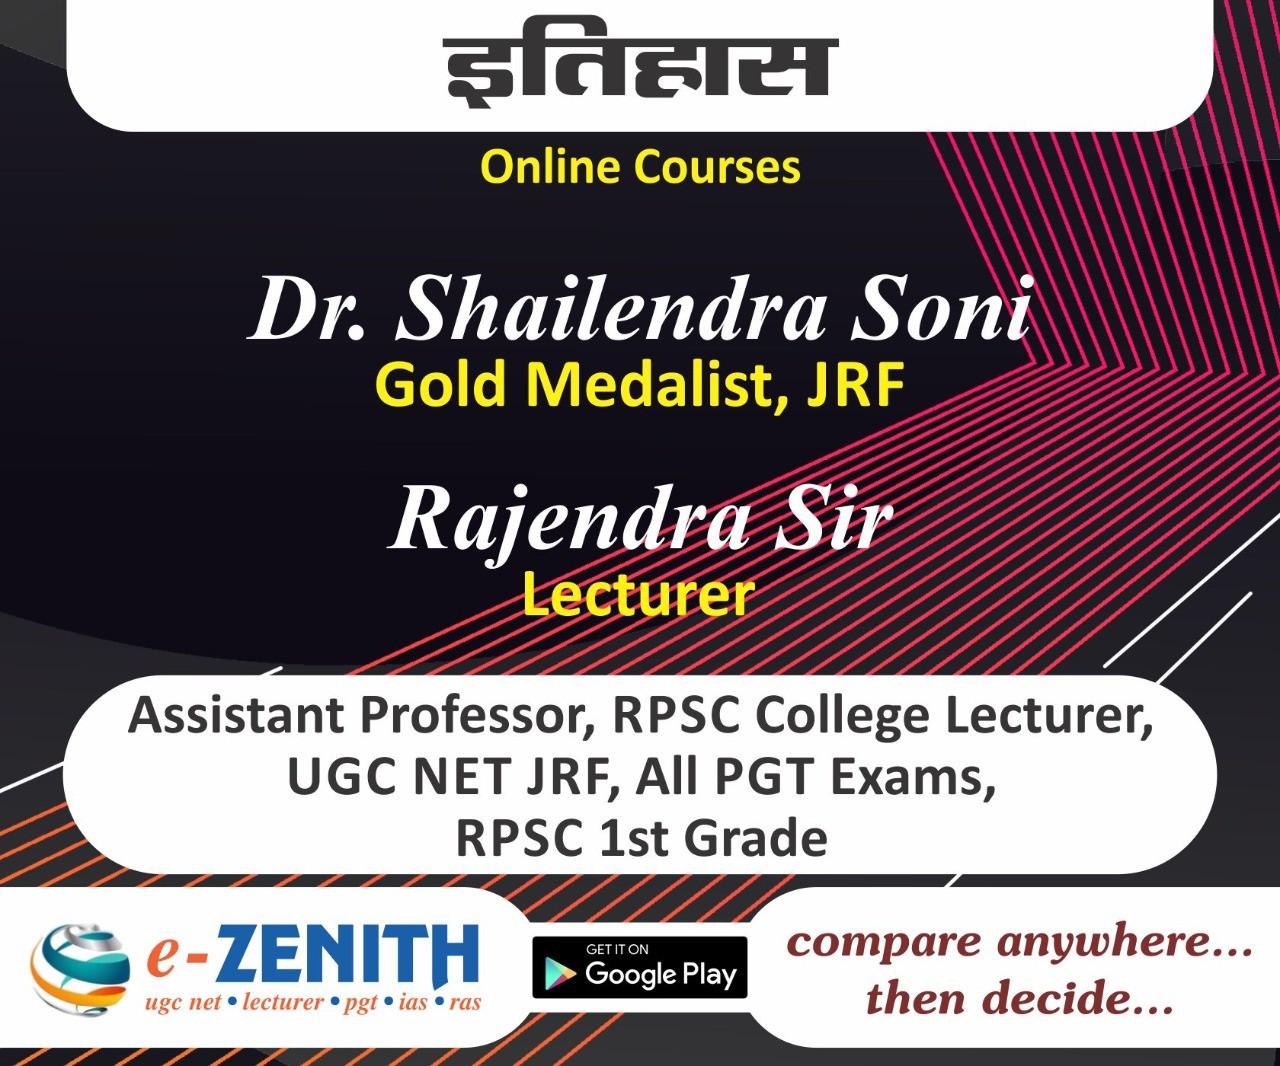 UGC NET, RPSC 1st GRADE HISTORY ONLINE COURSE